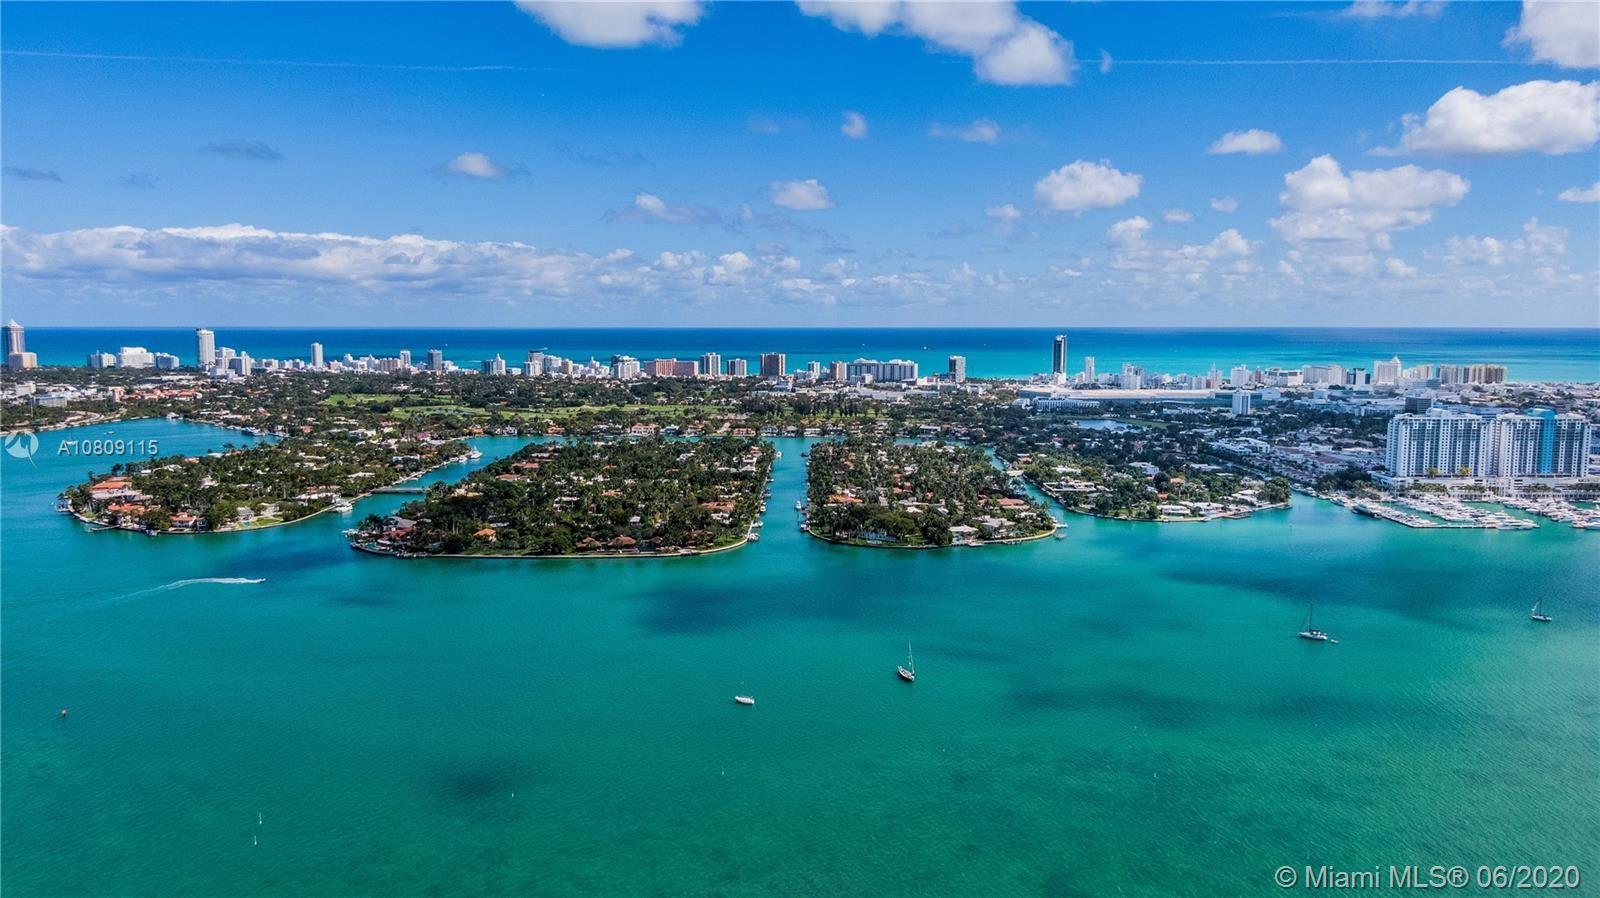 Photo 54 of Listing MLS a10809115 in 1635 W 22nd St Miami Beach FL 33140